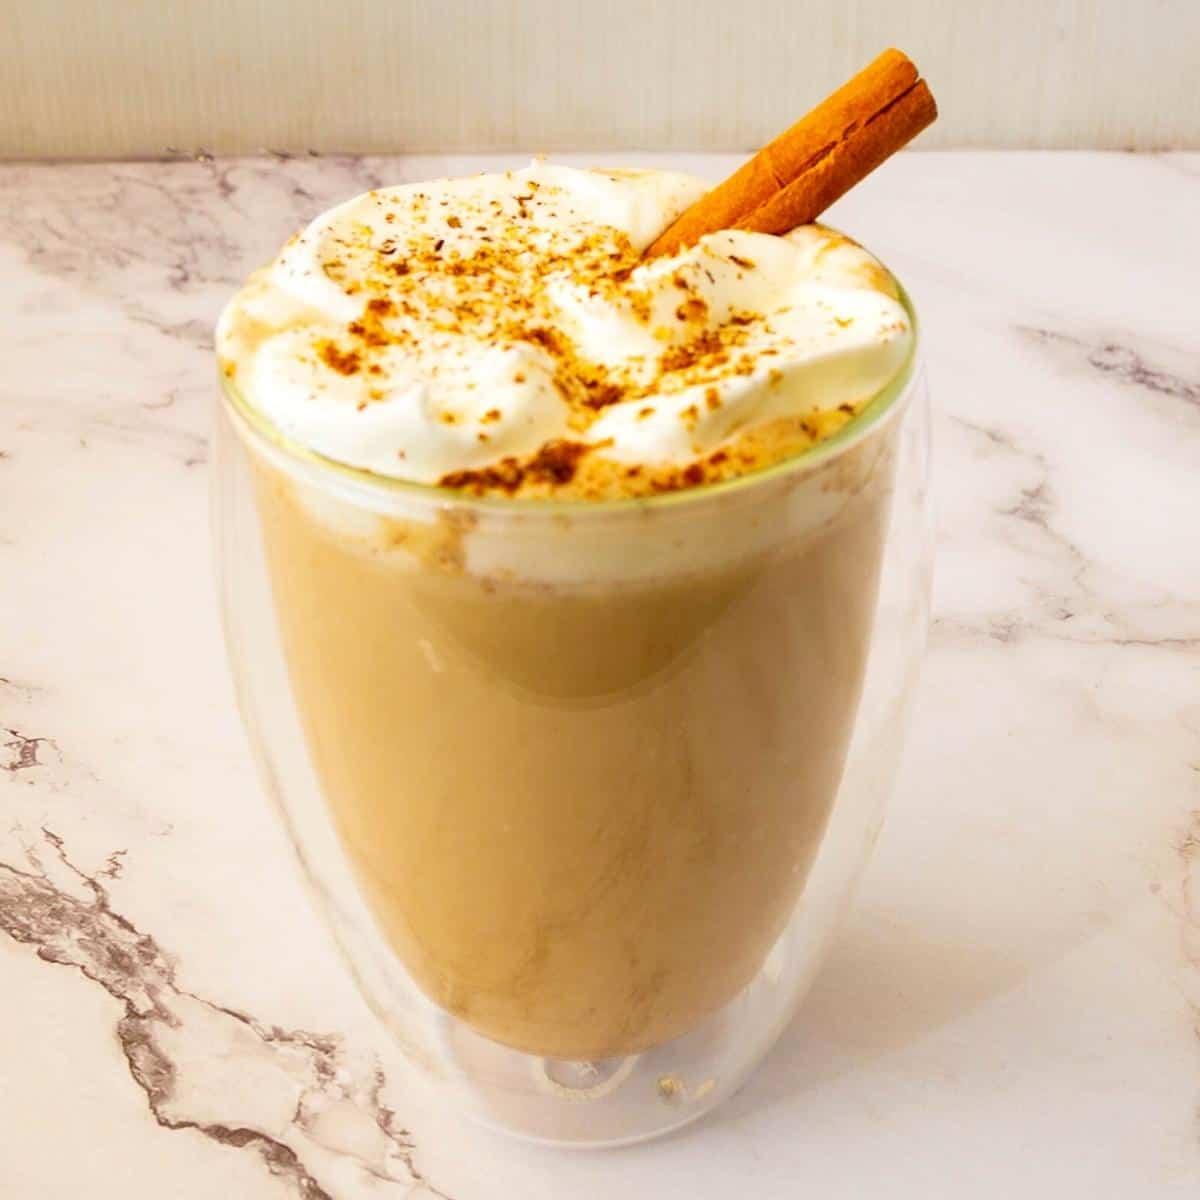 Spice Latte in a glass.